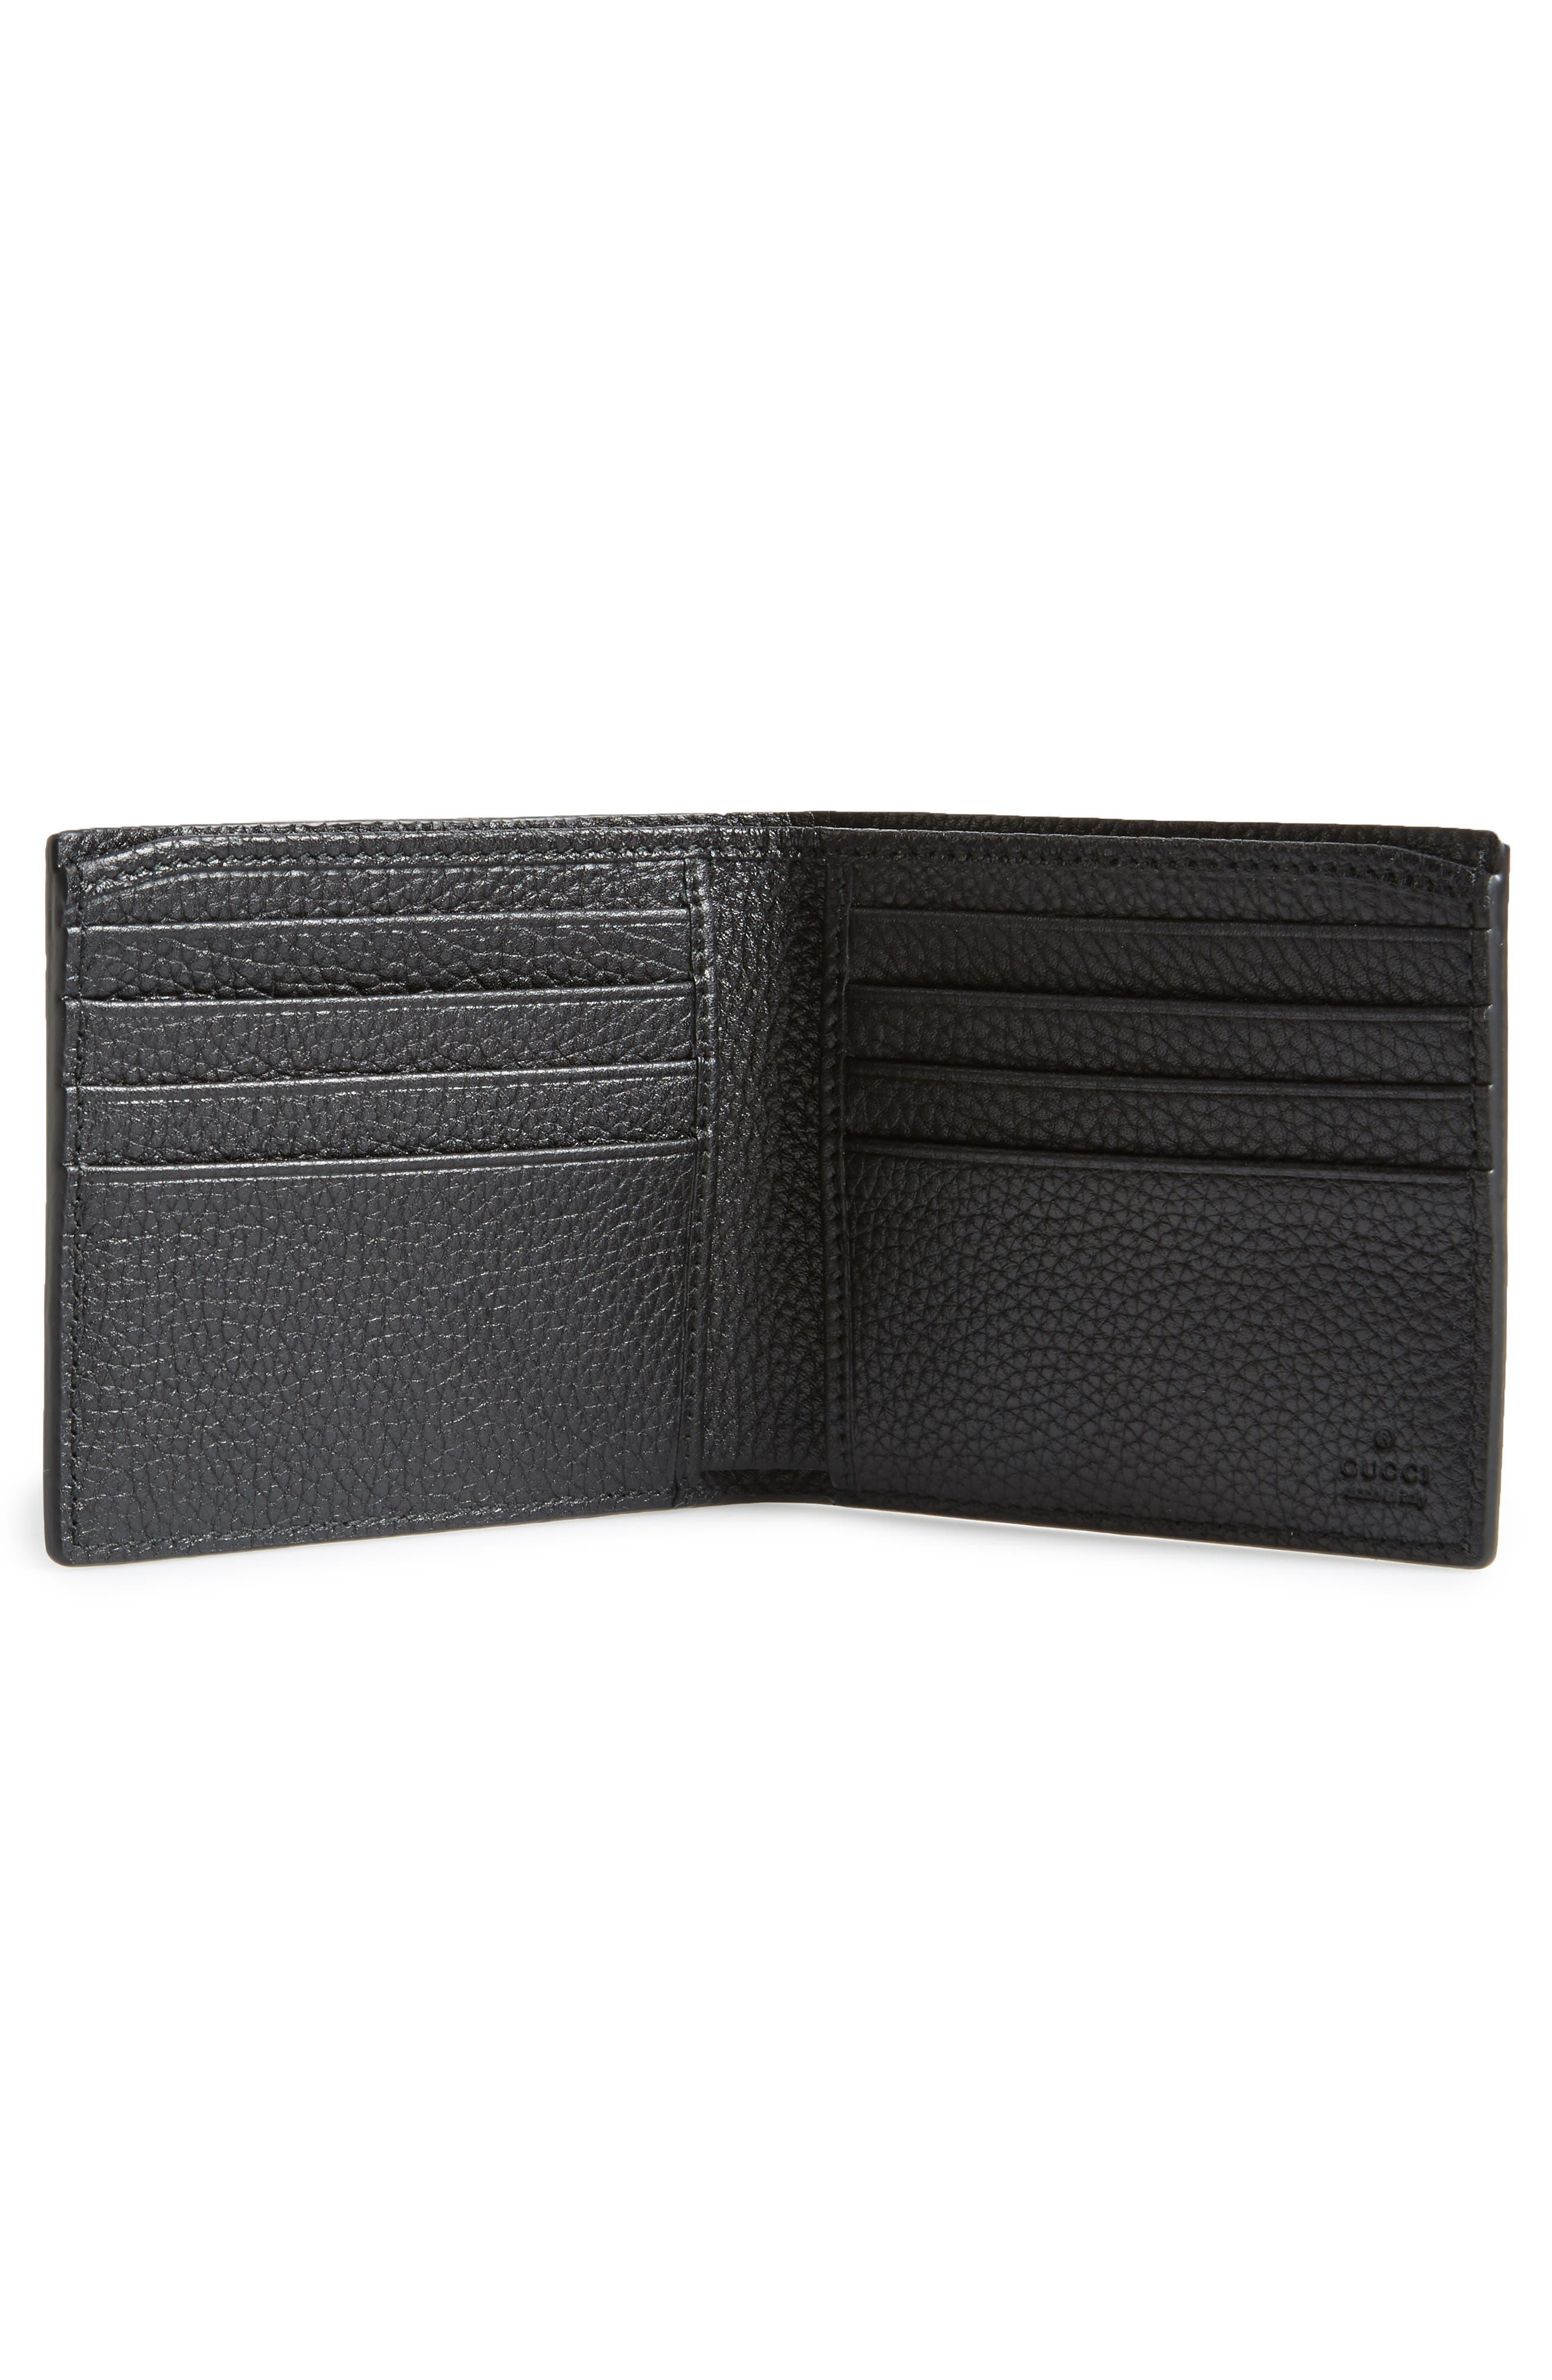 Dragon Leather Wallet,                             Alternate thumbnail 2, color,                             001